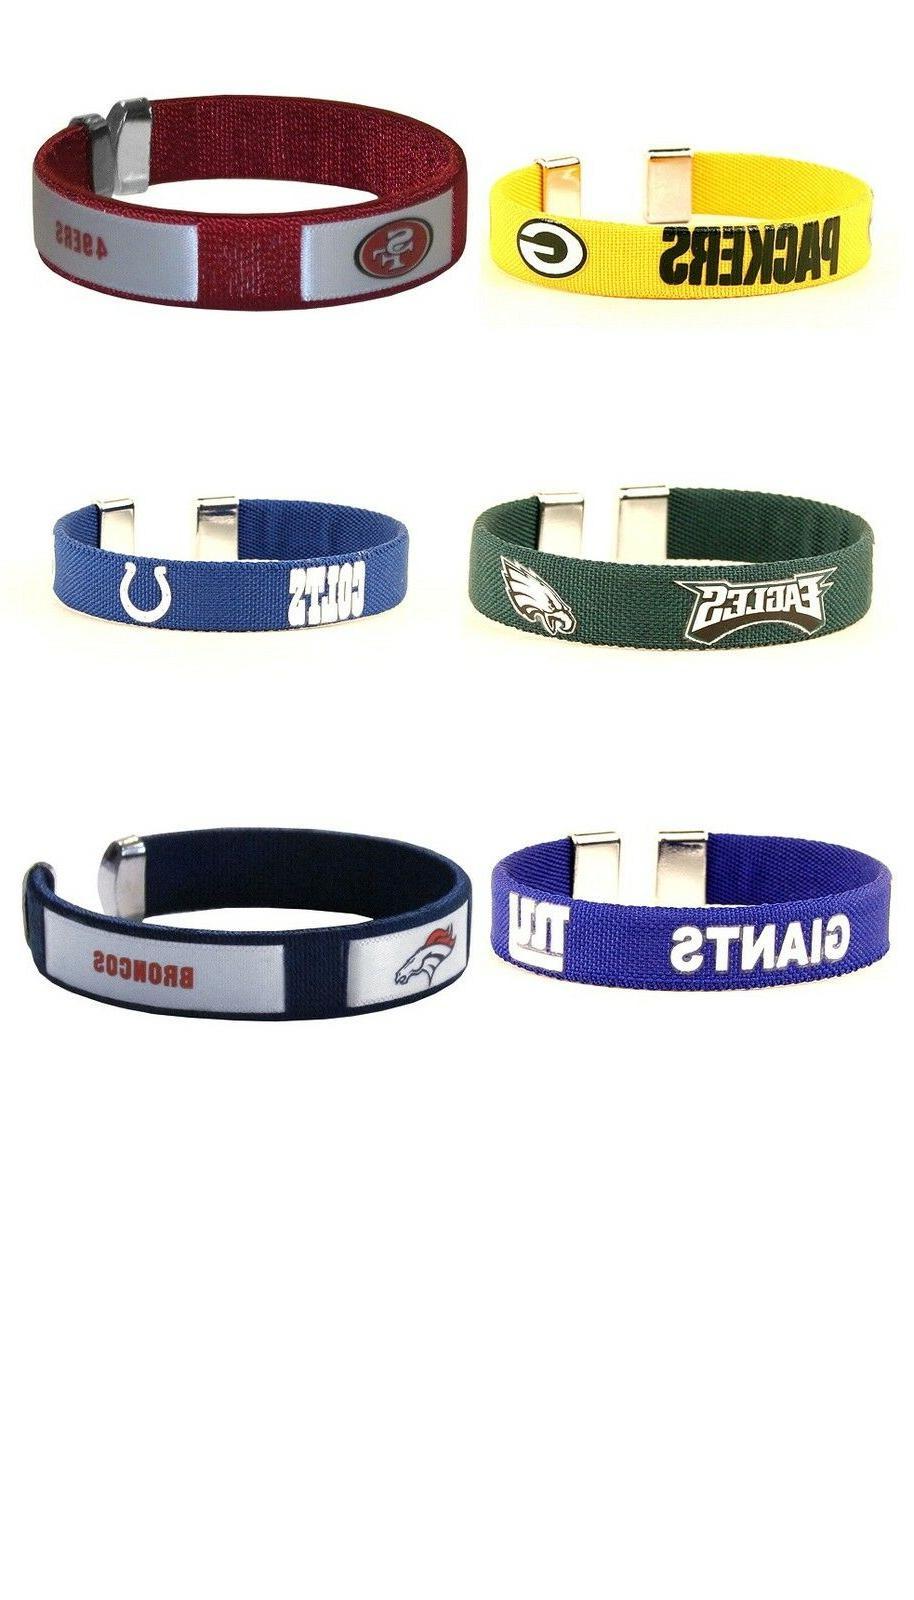 nfl fan band bracelet pick your team